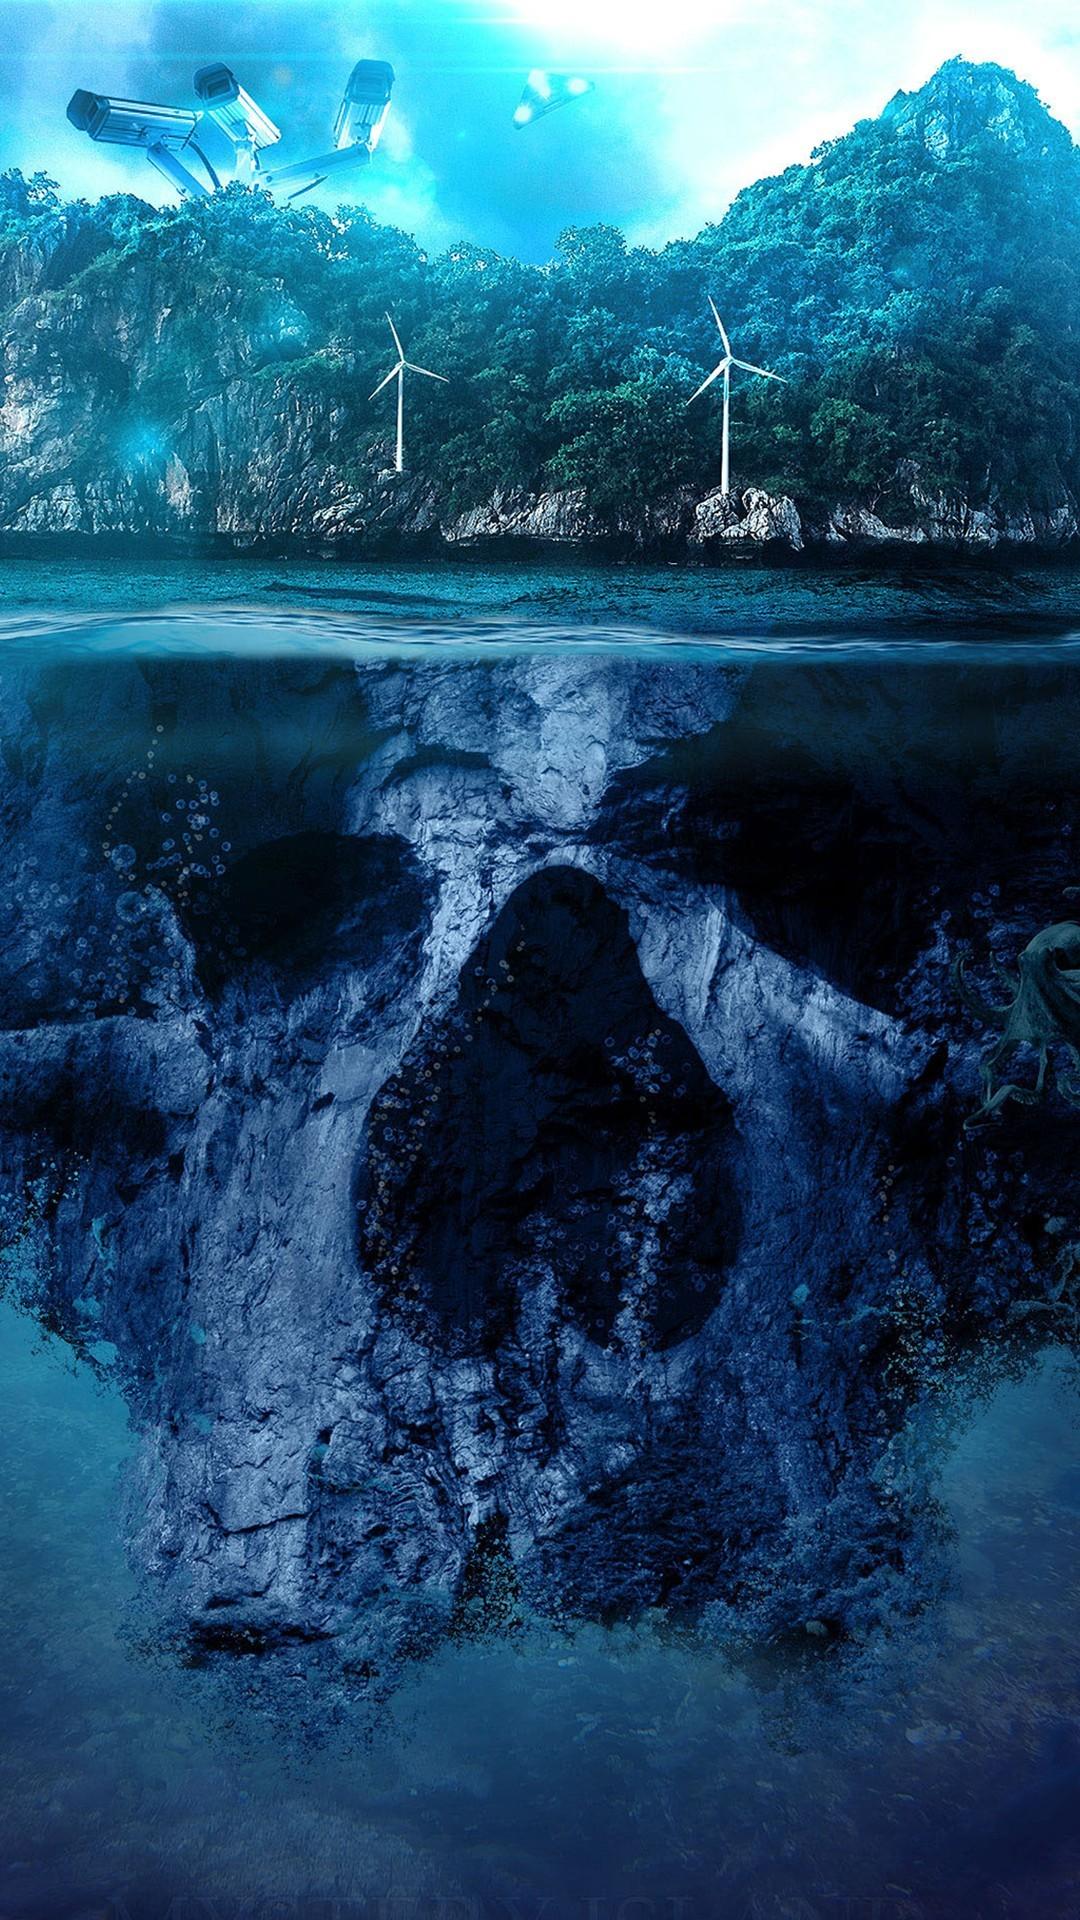 Free Mystery Skull Island phone wallpaper by devanxx33